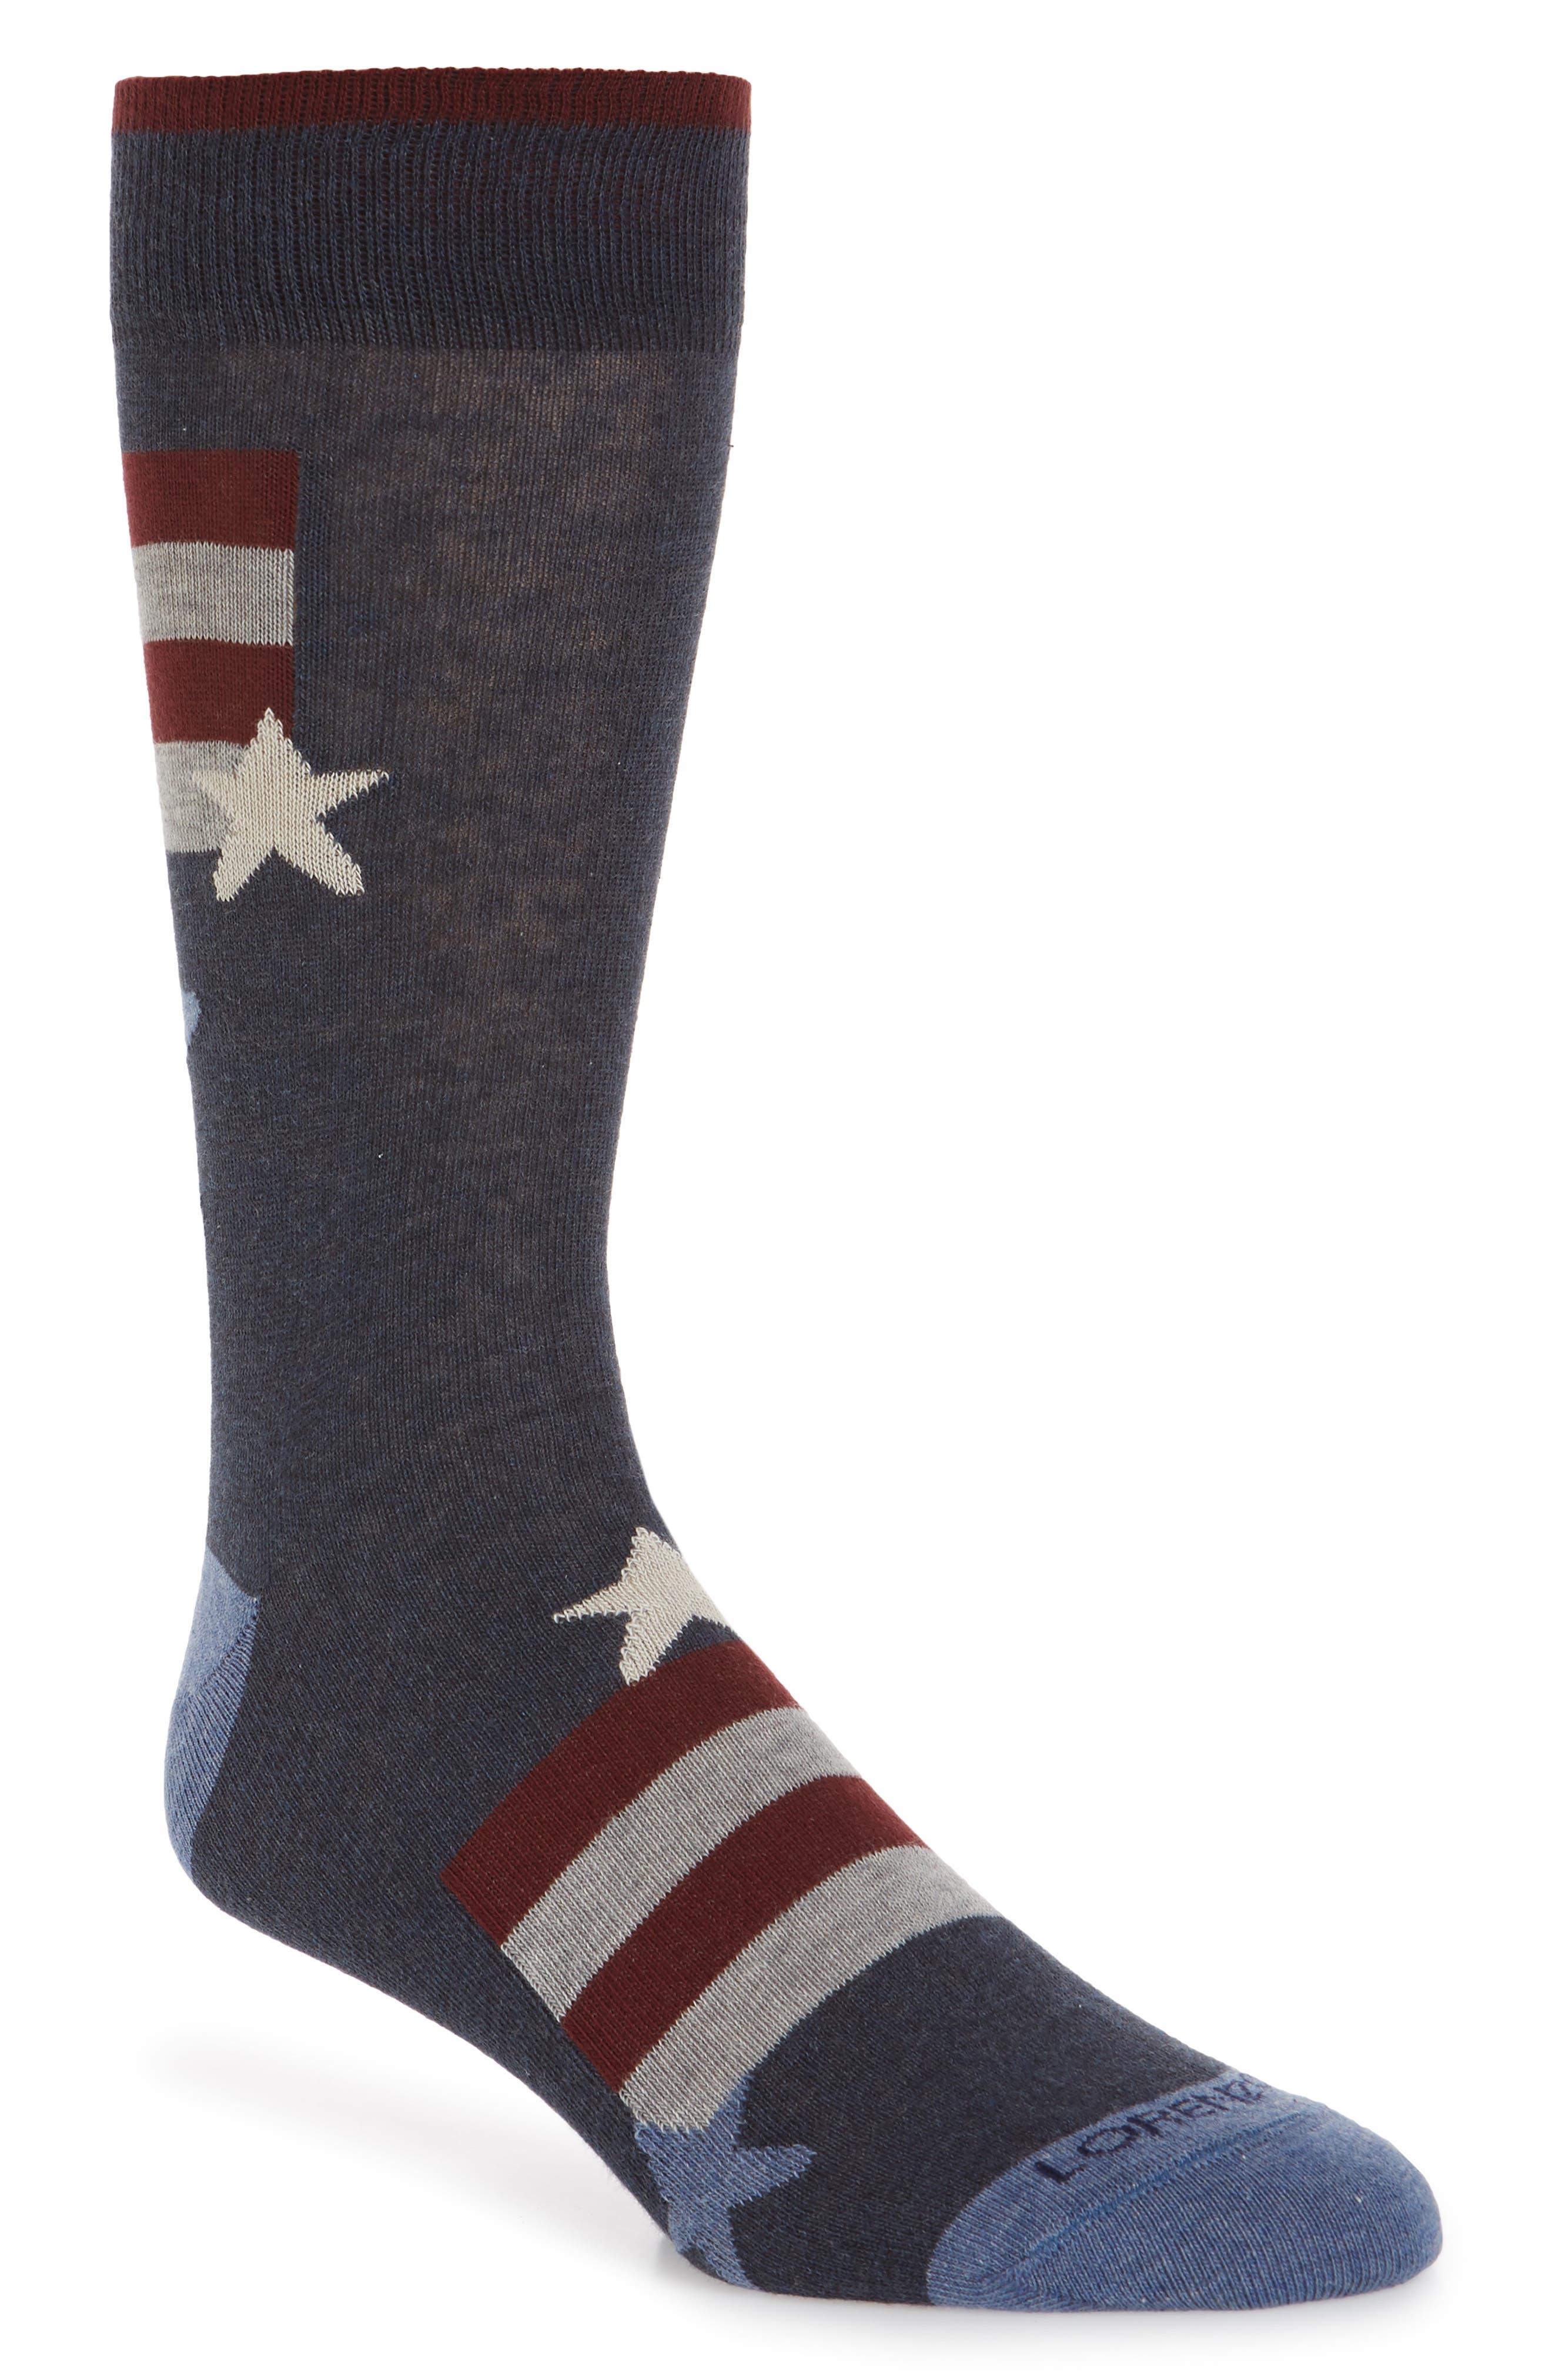 Stars and Stripes Socks,                             Main thumbnail 1, color,                             DENIM